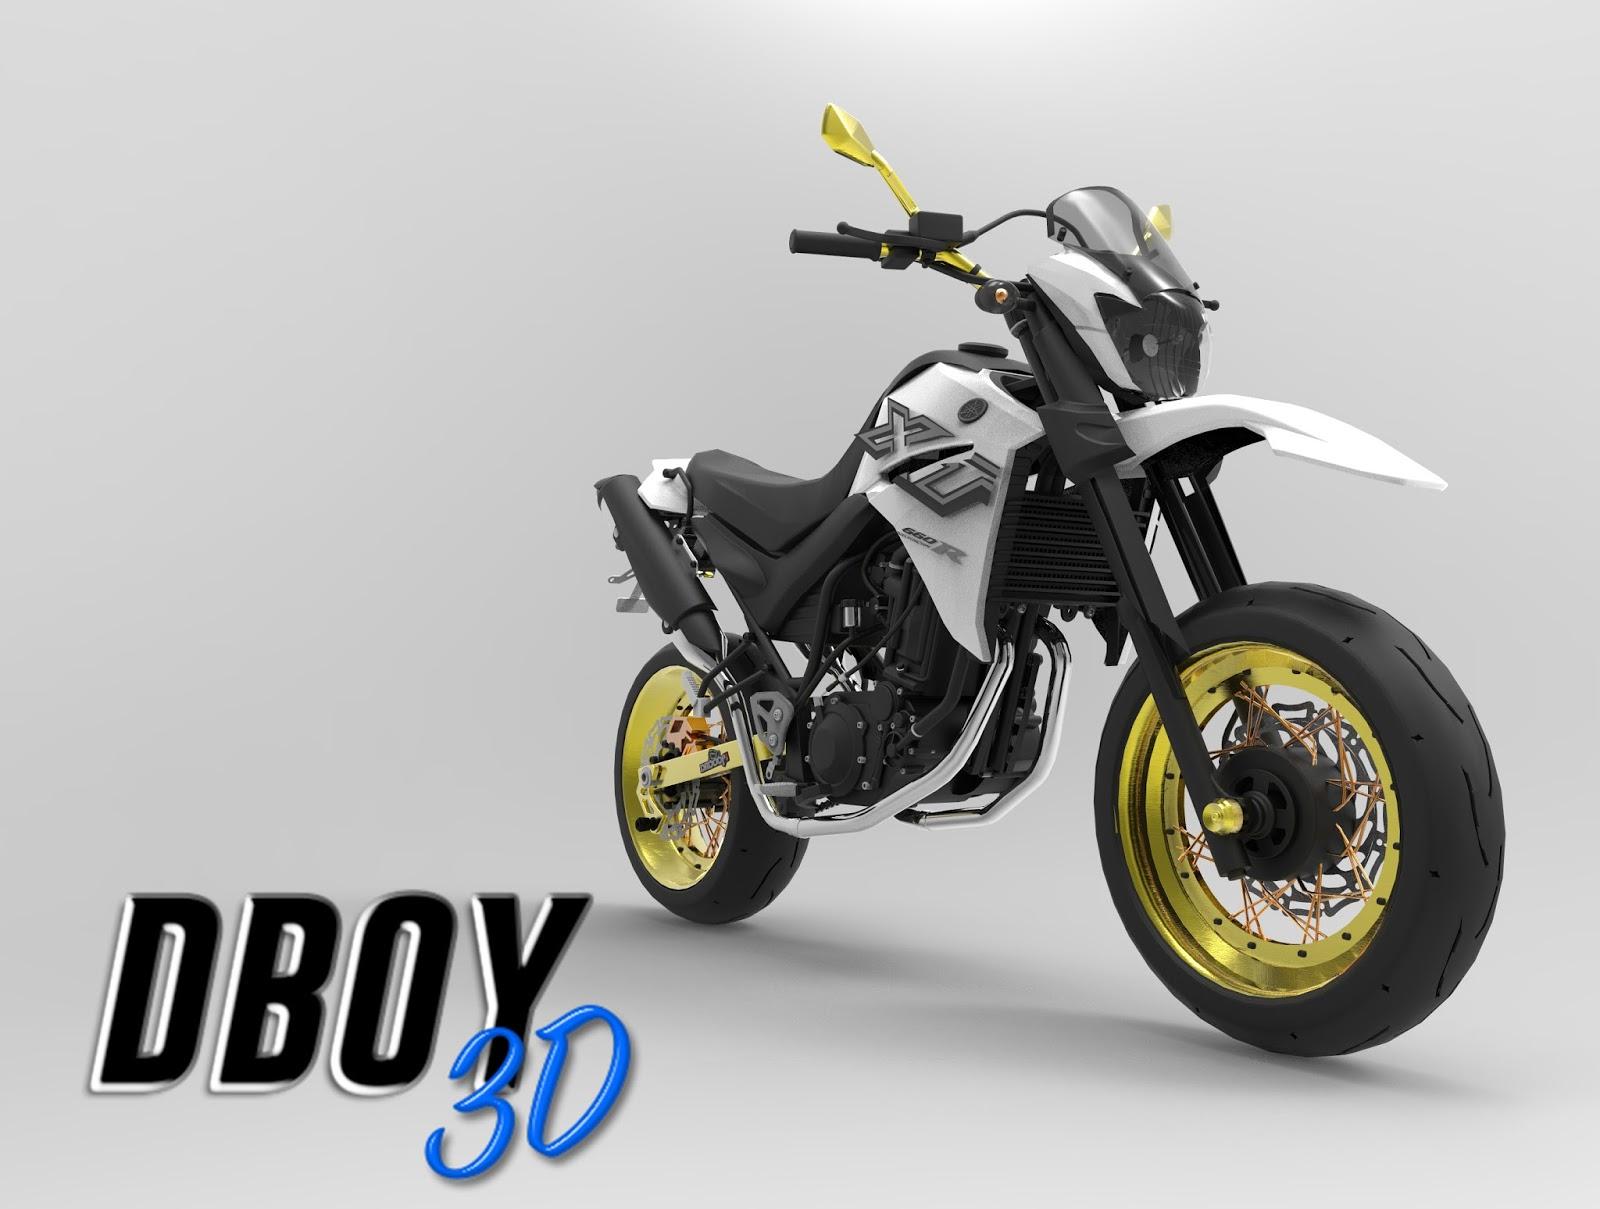 Yamaha Xt 660 Supermotard Dboy 3d